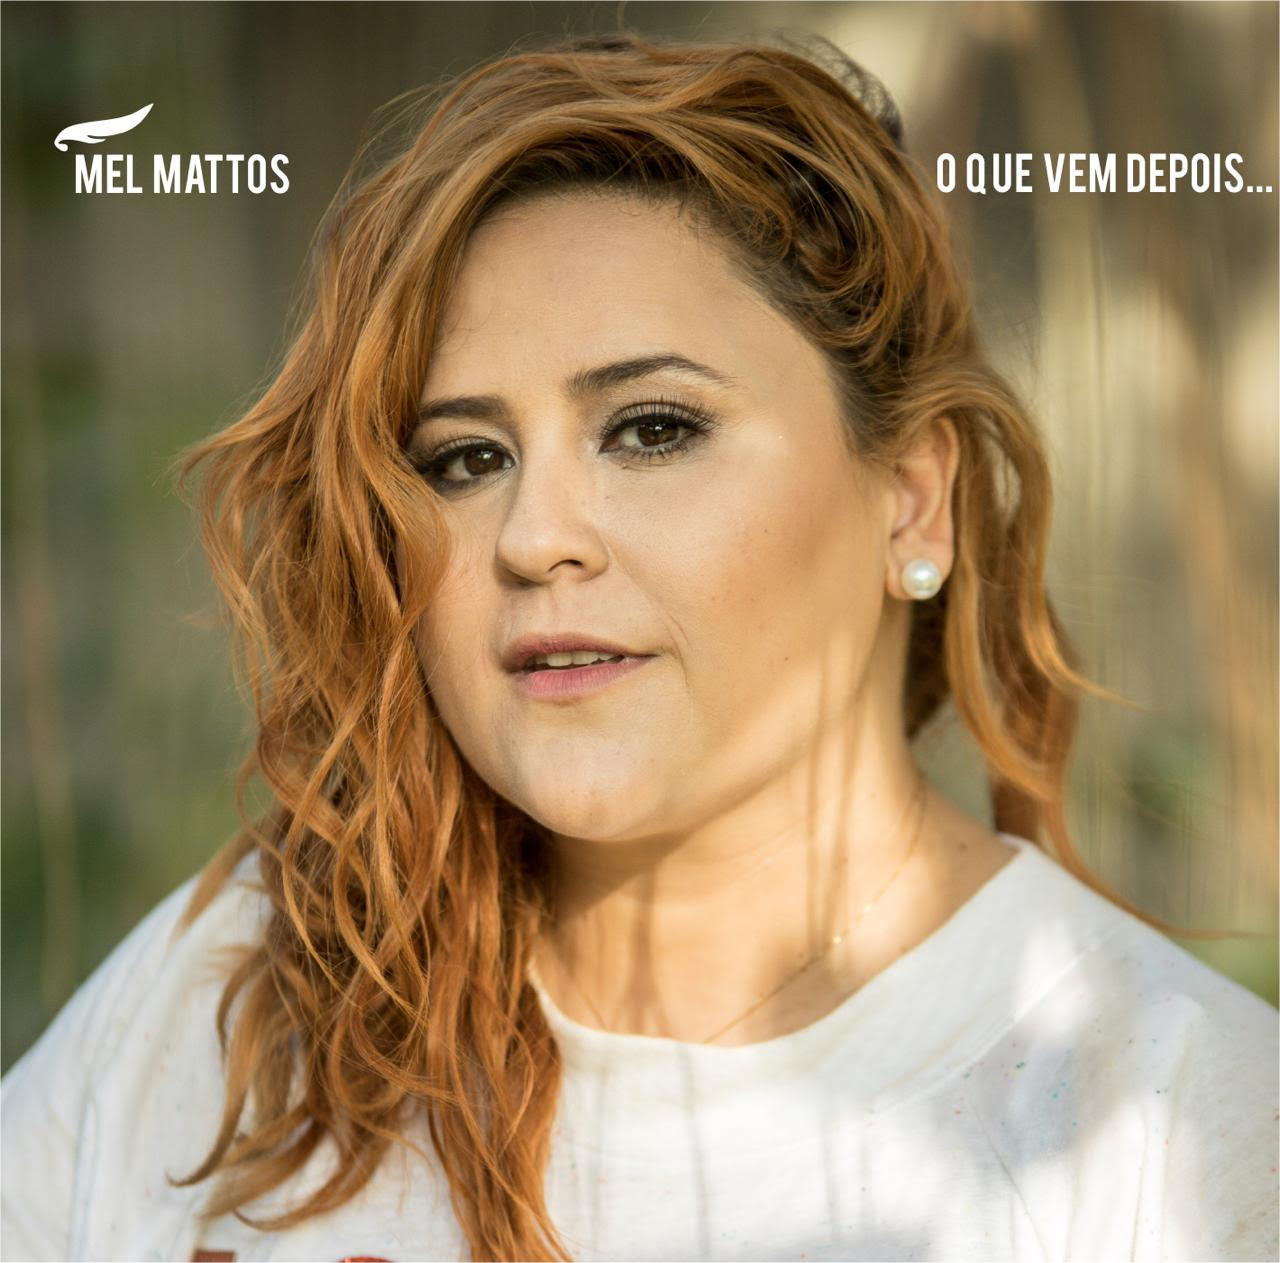 964f8dfbad419 Cantora Mel Mattos lança novo single através da Distribuidora Digital  Nacional ONErpm